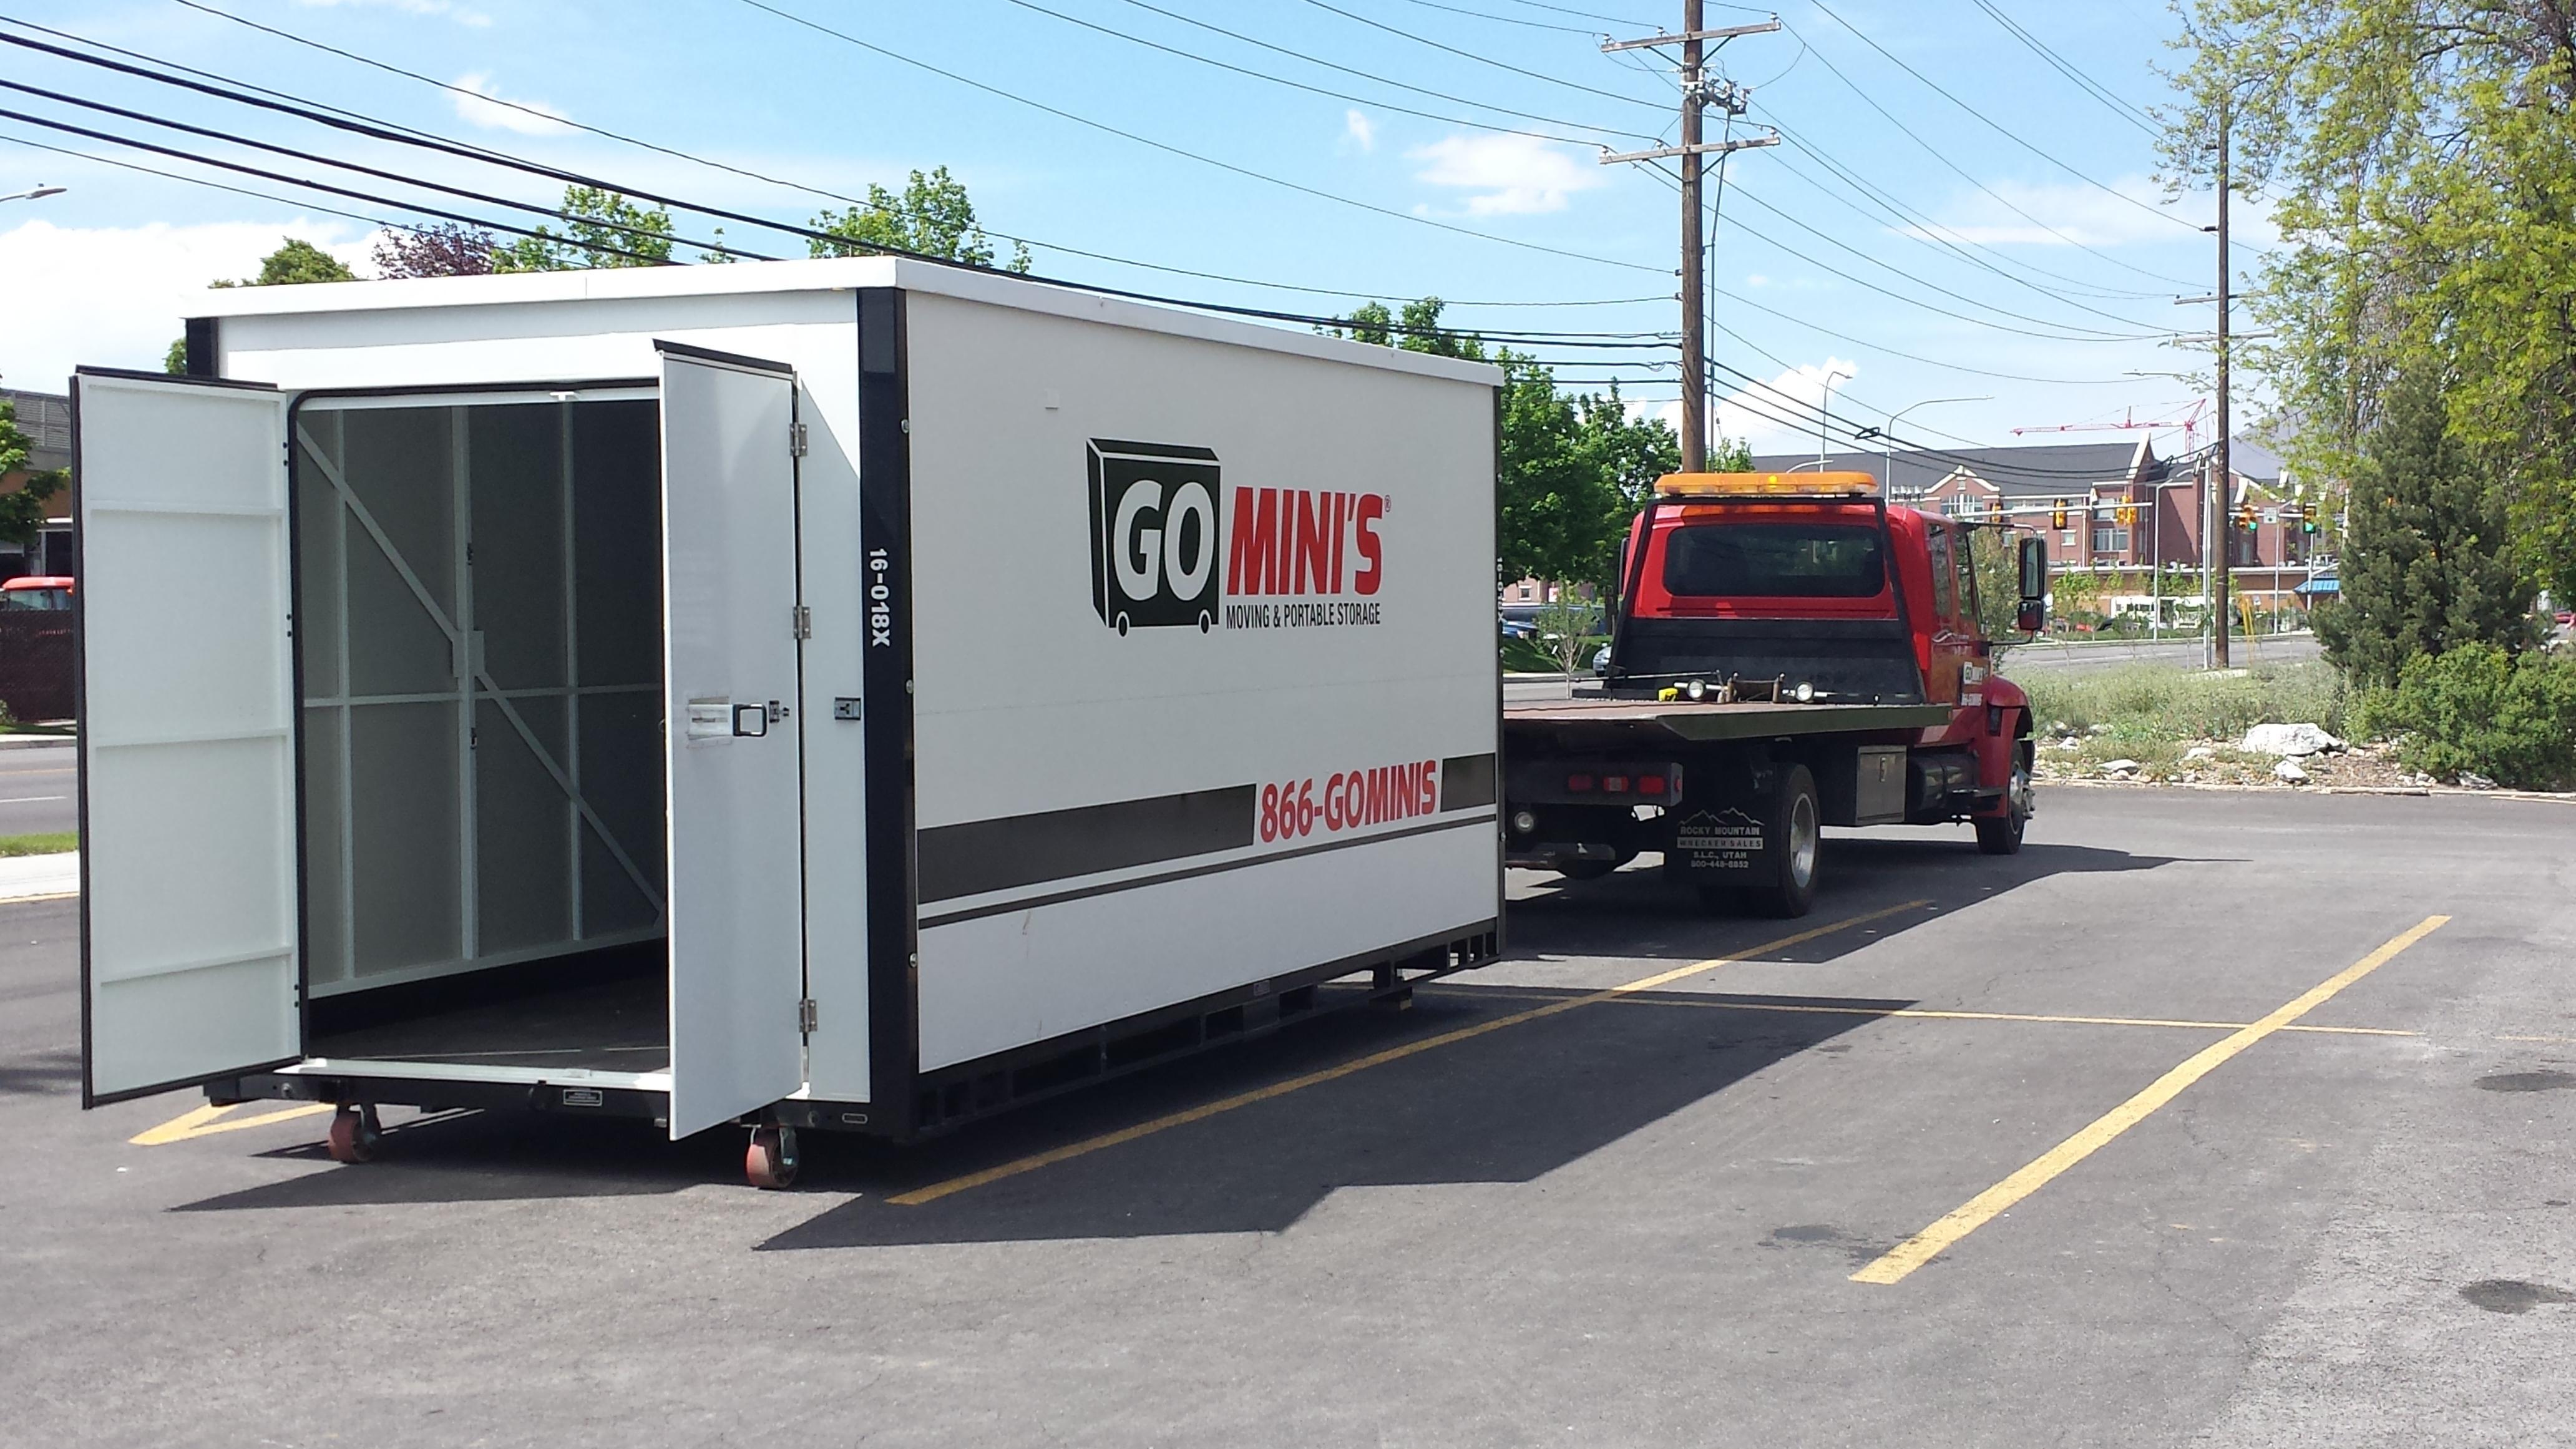 Go Mini's Moving & Portable Storage image 12